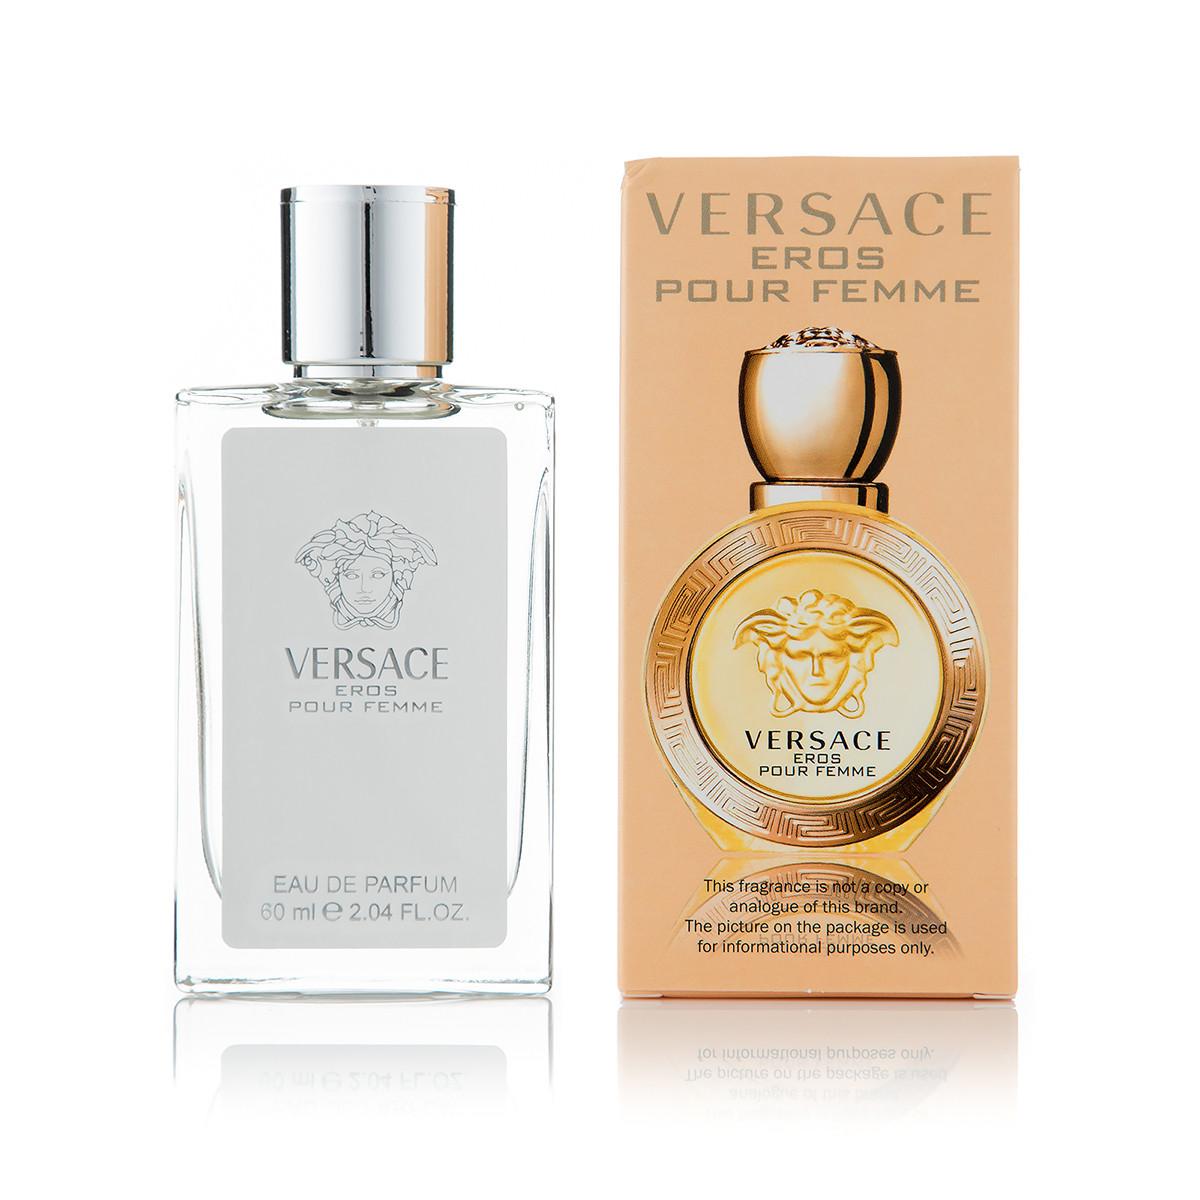 60 мл мини-парфюм Versace Eros Pour Femme (Ж)